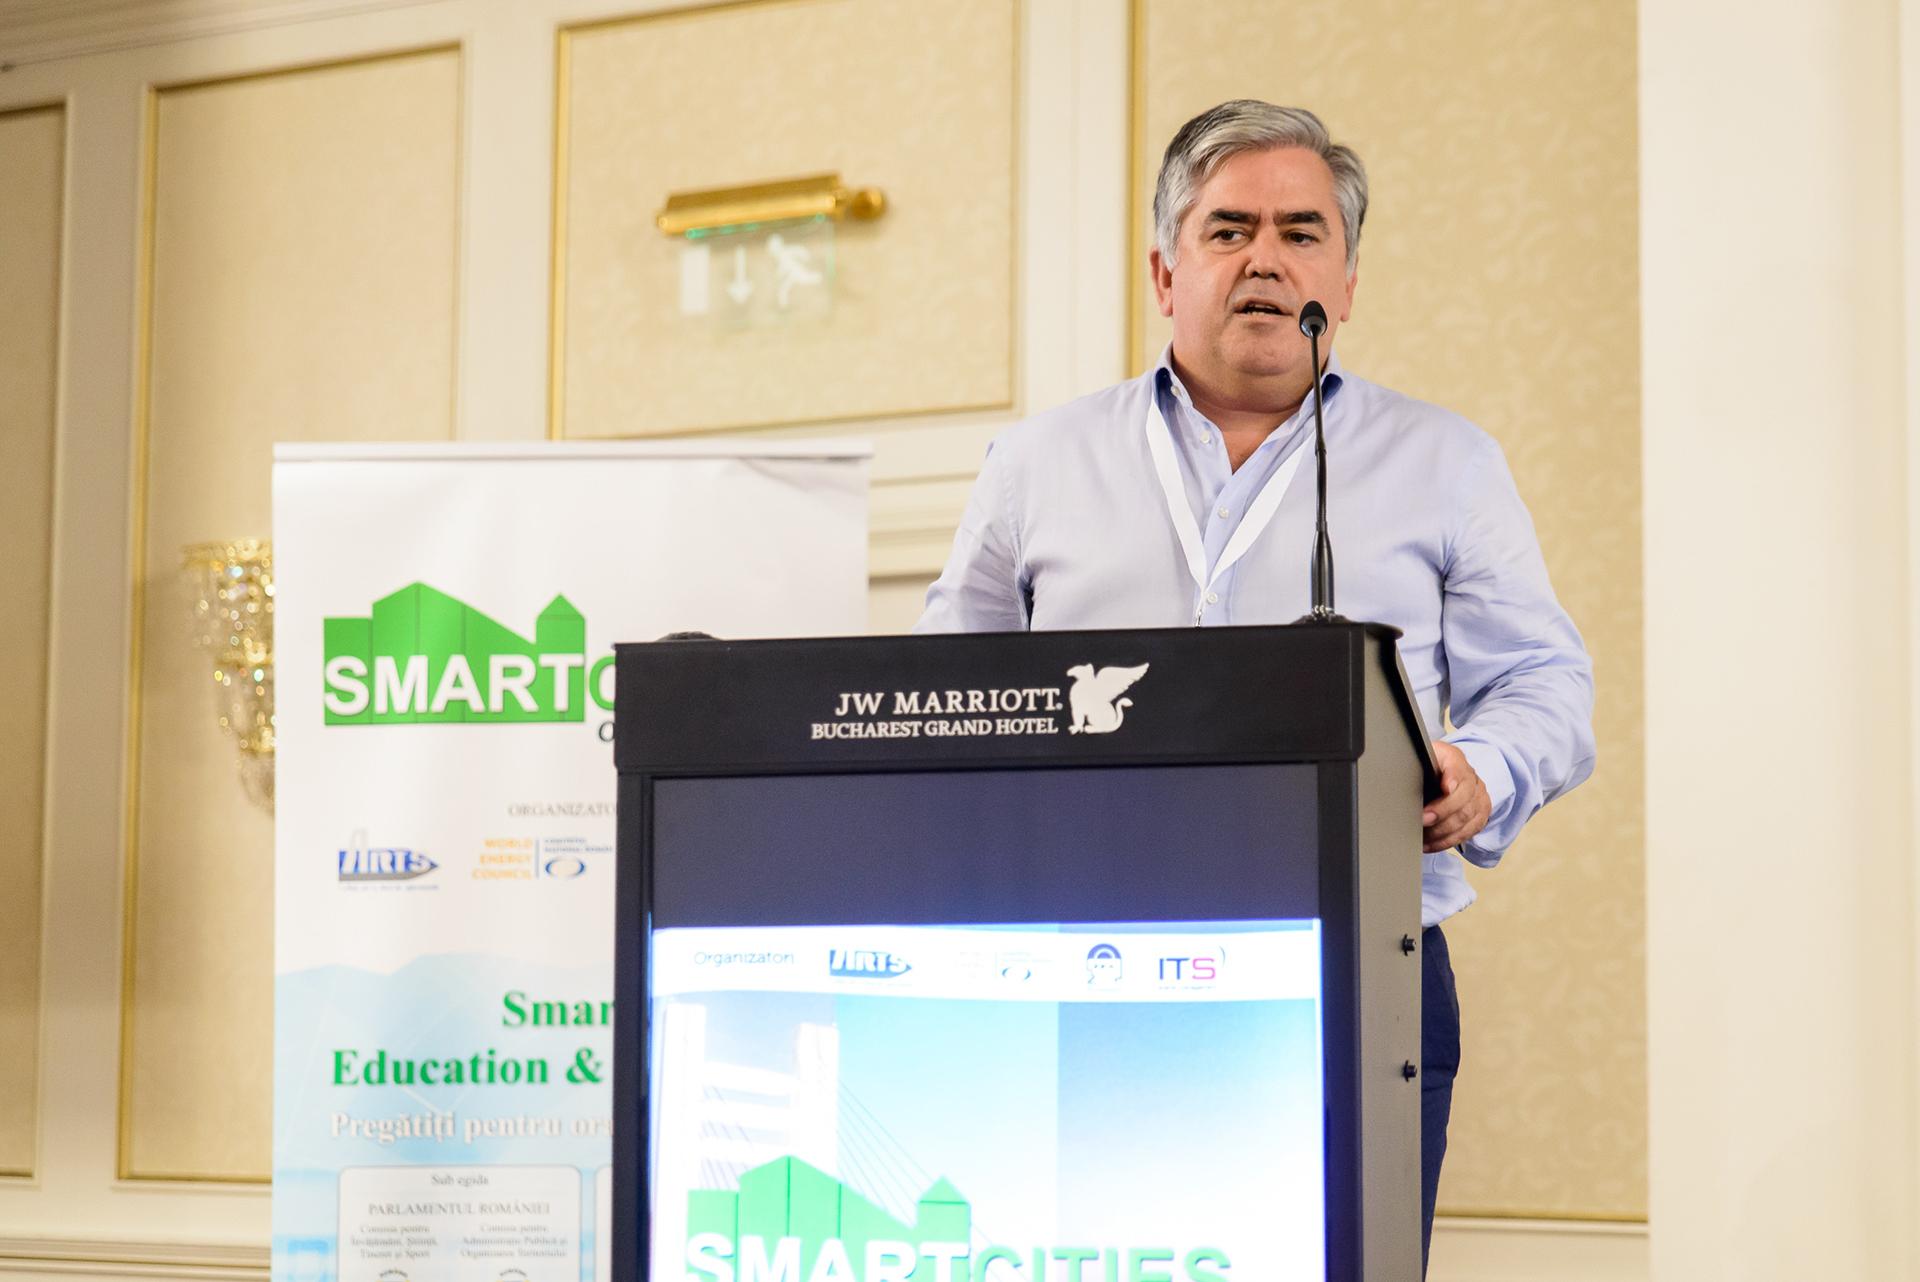 Smart-Cities-Of-Romania-2017---ITS-641